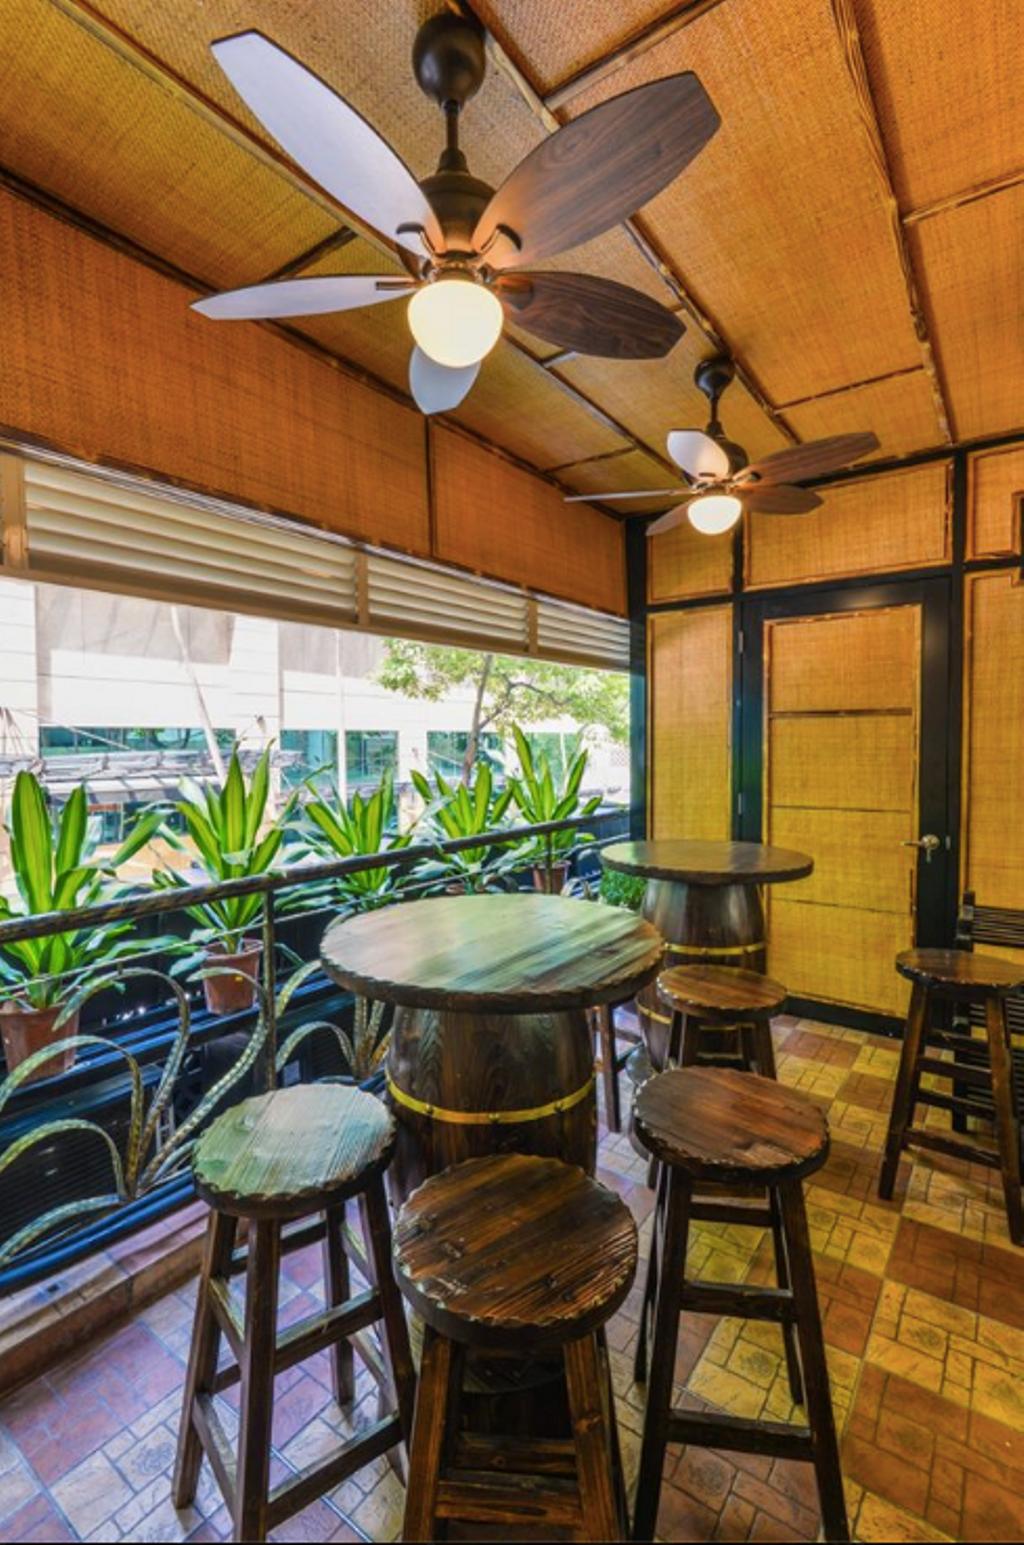 Shun De Gong Restaurant, Bukit Bintang, Commercial, Interior Designer, GI Design Sdn Bhd, Industrial, Traditional, Chair, Furniture, Dining Table, Table, Bowl, Balcony